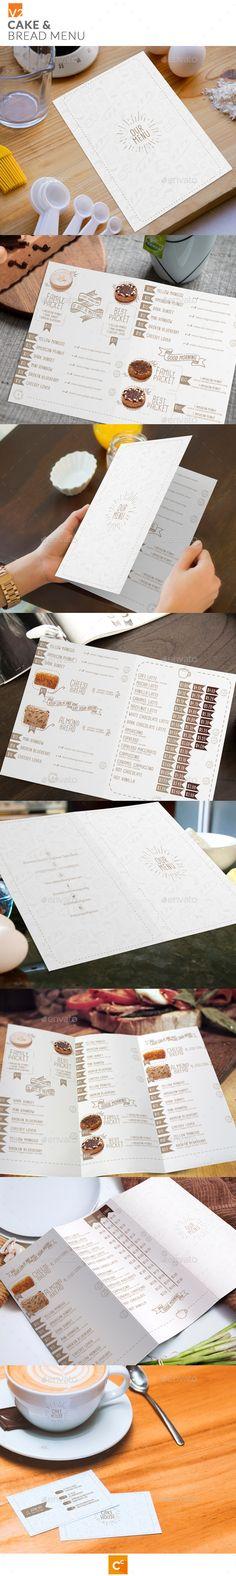 Cake & Bread Menu Template #design Download: http://graphicriver.net/item/cake-bread-menu-v2/11370393?ref=ksioks